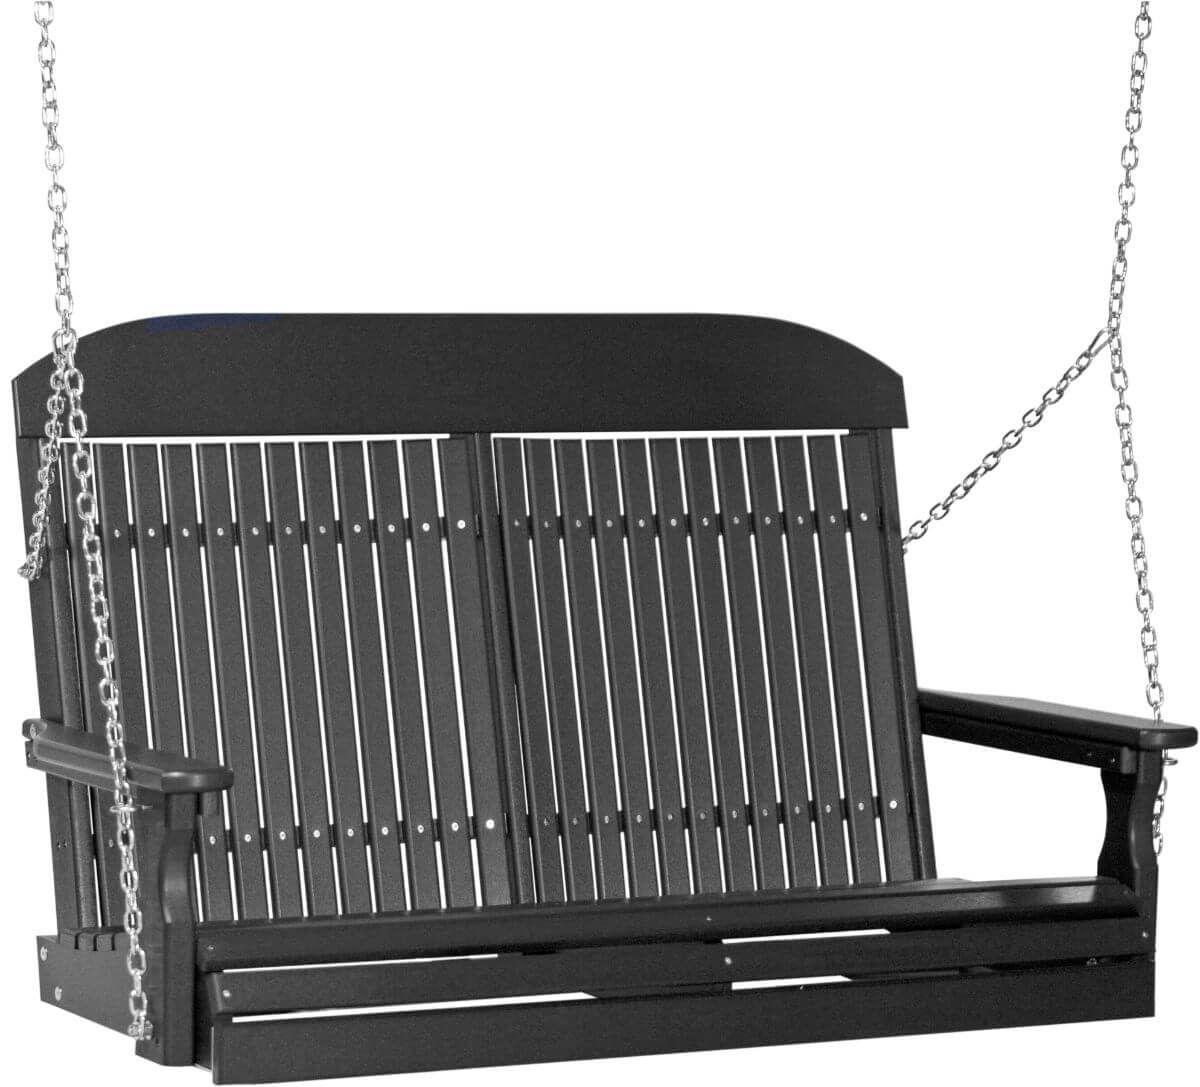 Black Stockton Porch Swing